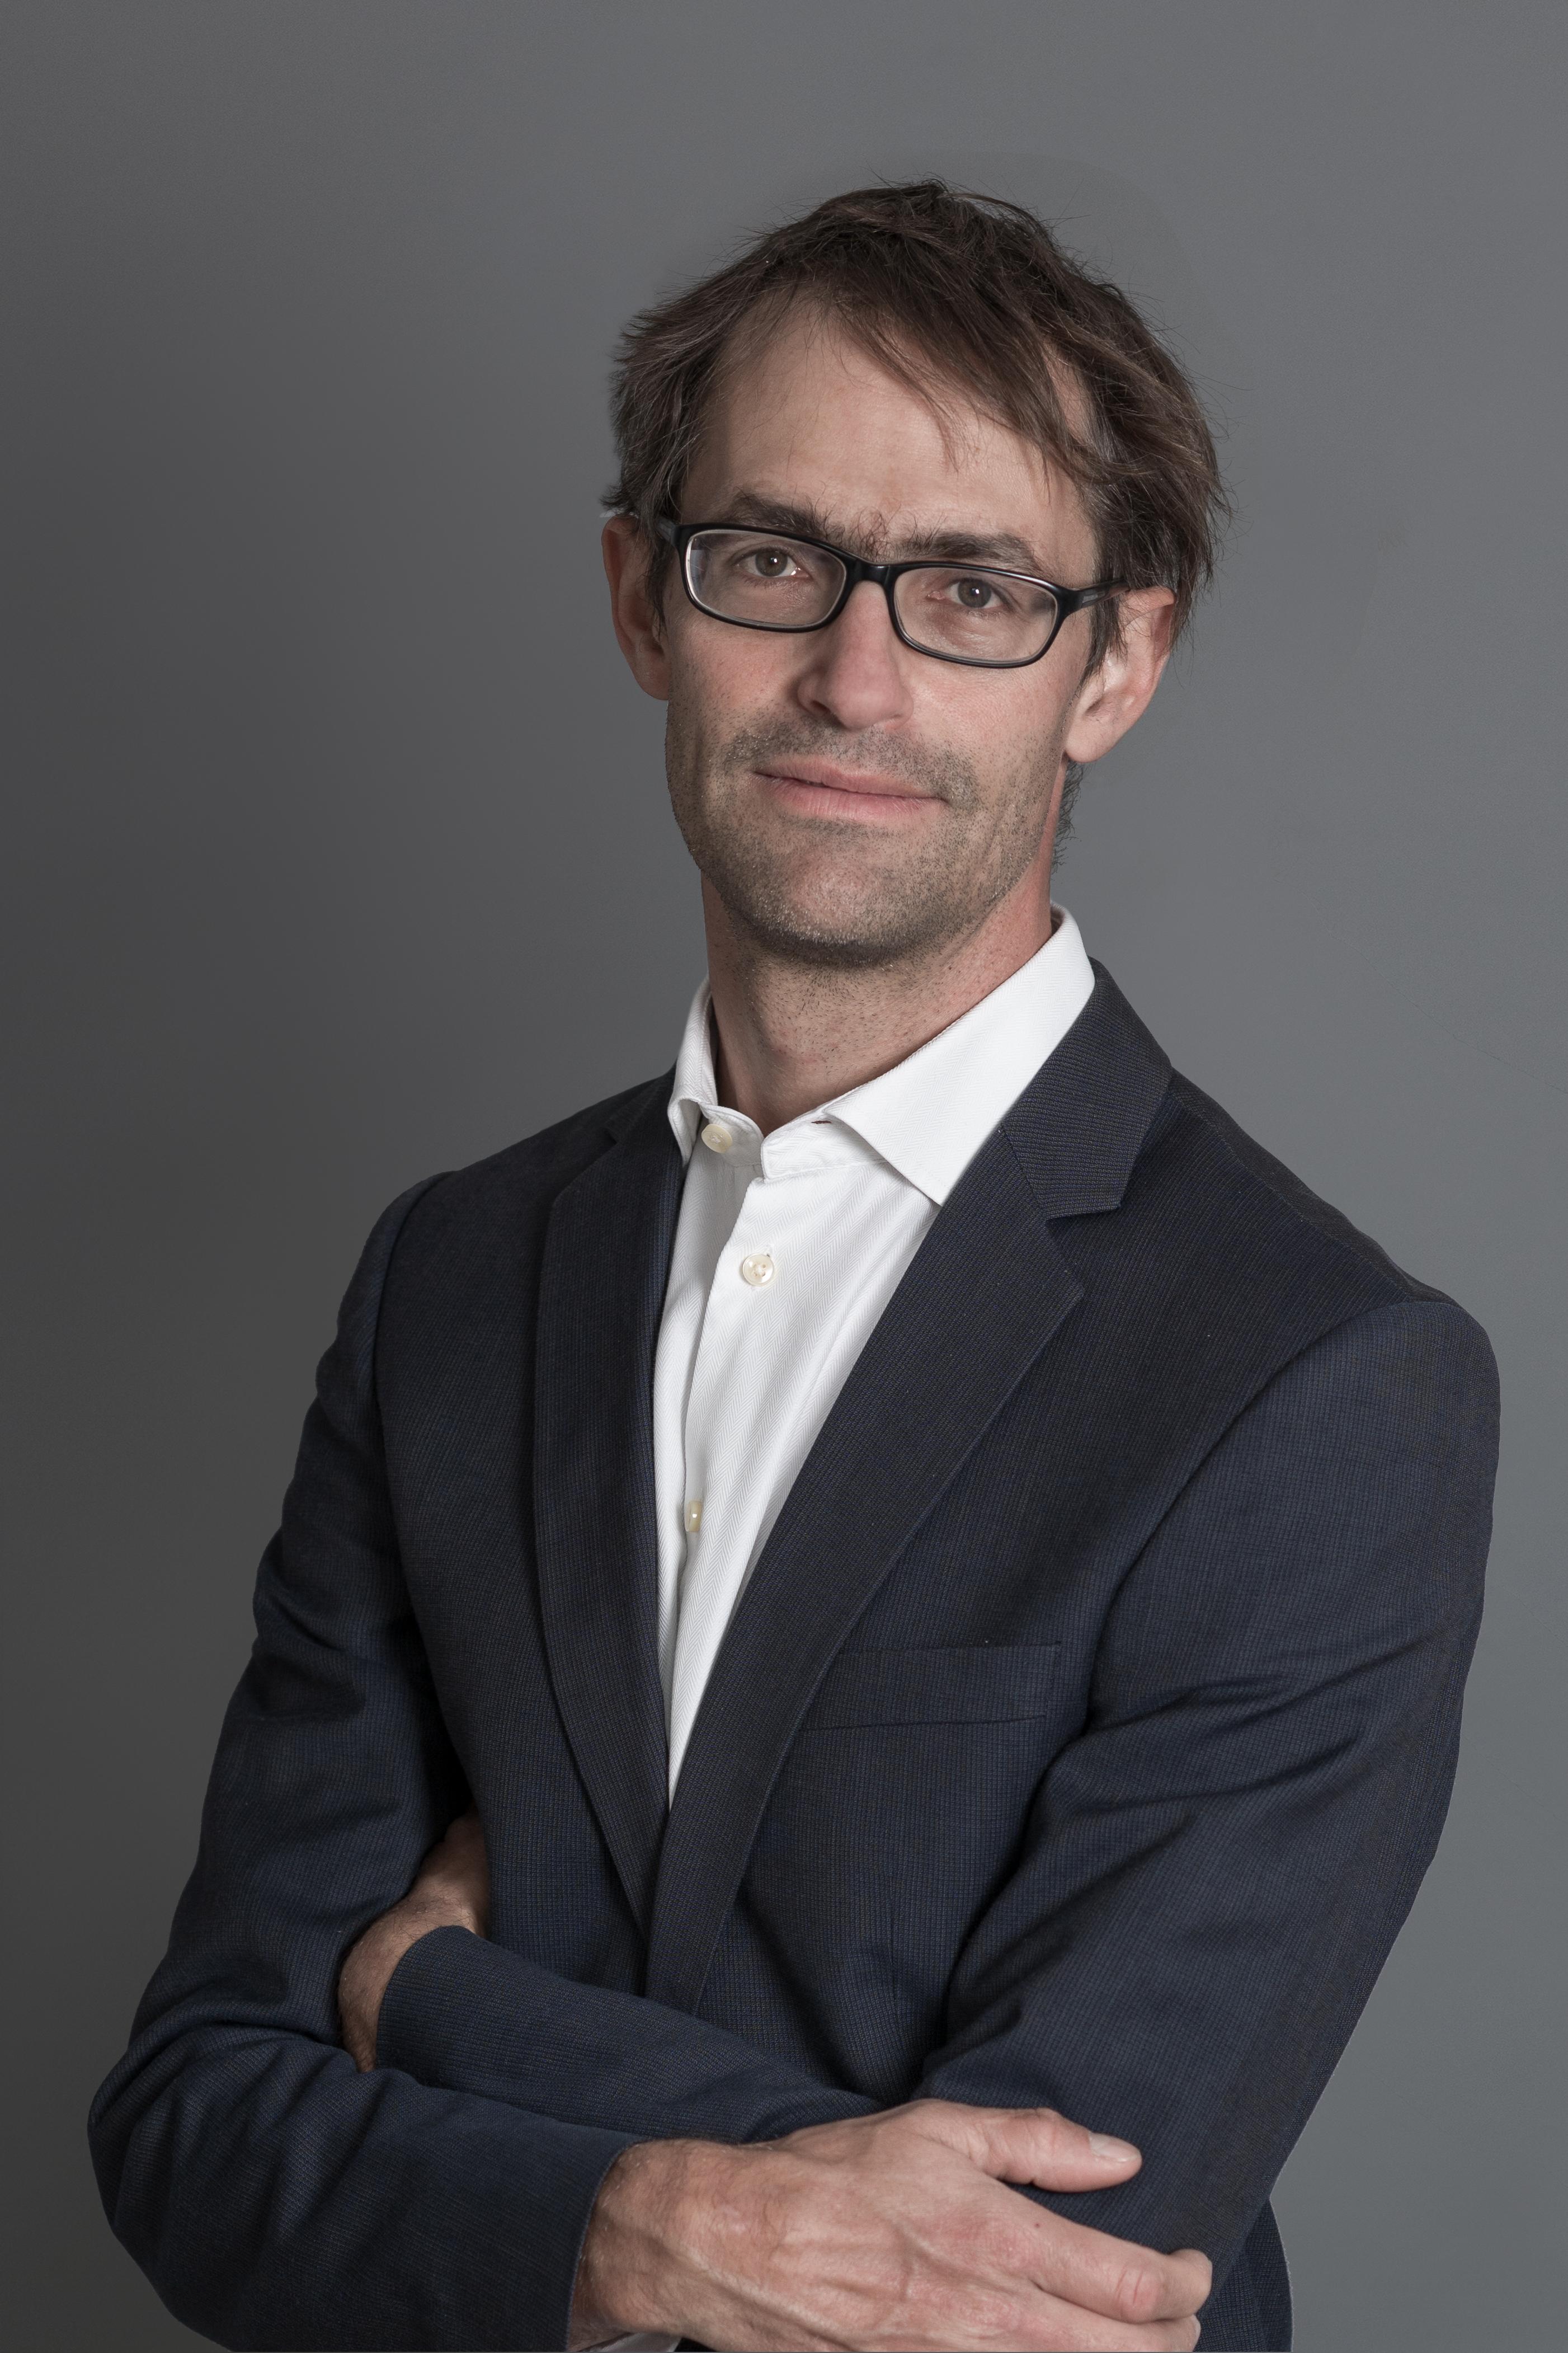 Andreas Manhart